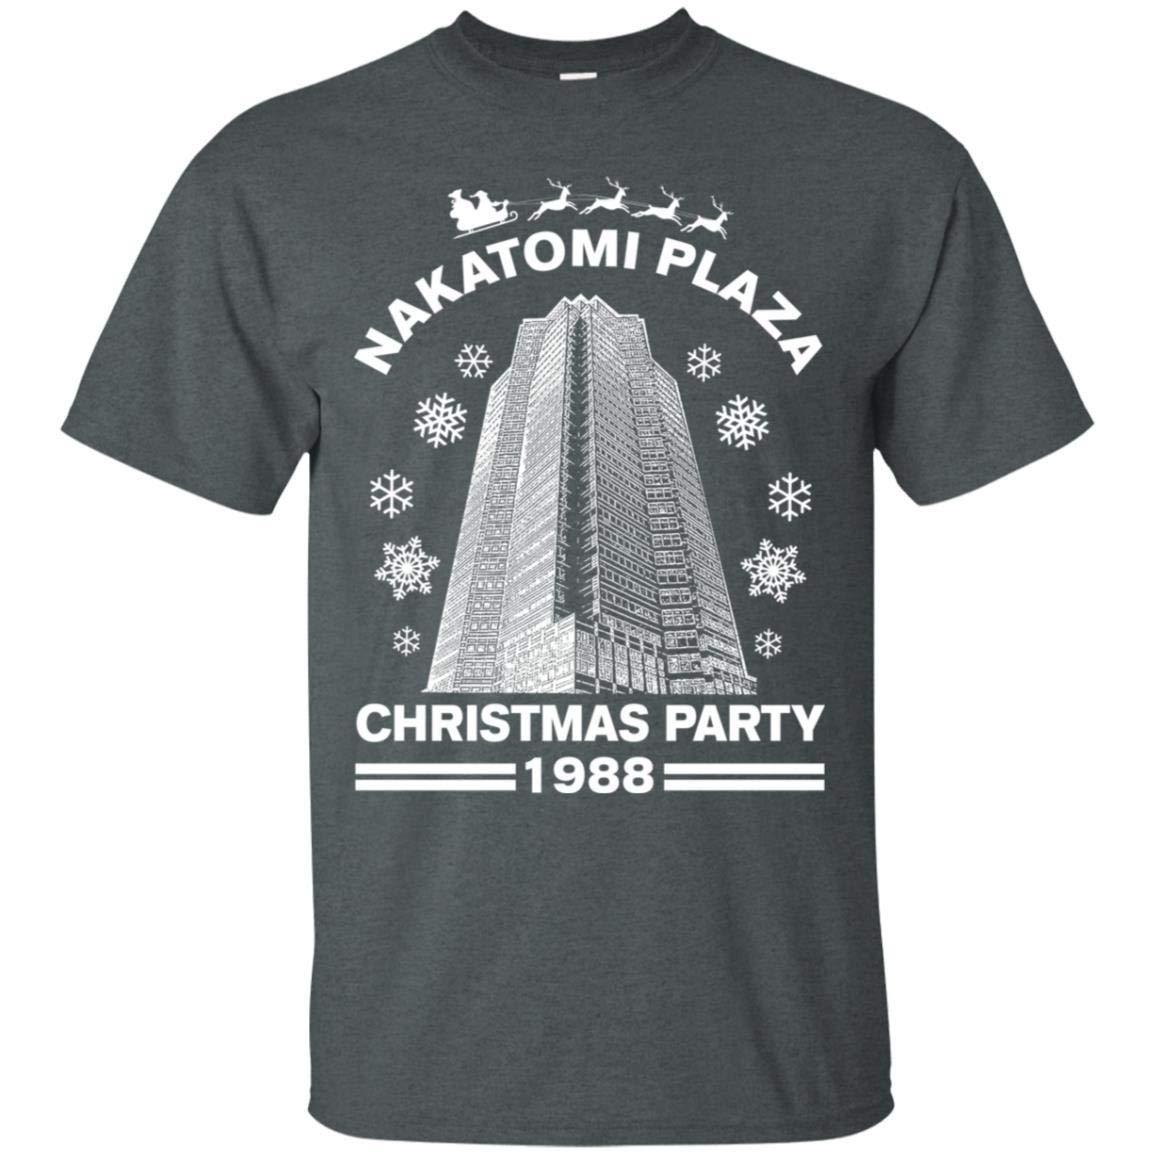 Teepowers Nakatomi Plaza Christmas Party 1988 Funny Pop Culture Unisex Tshirt